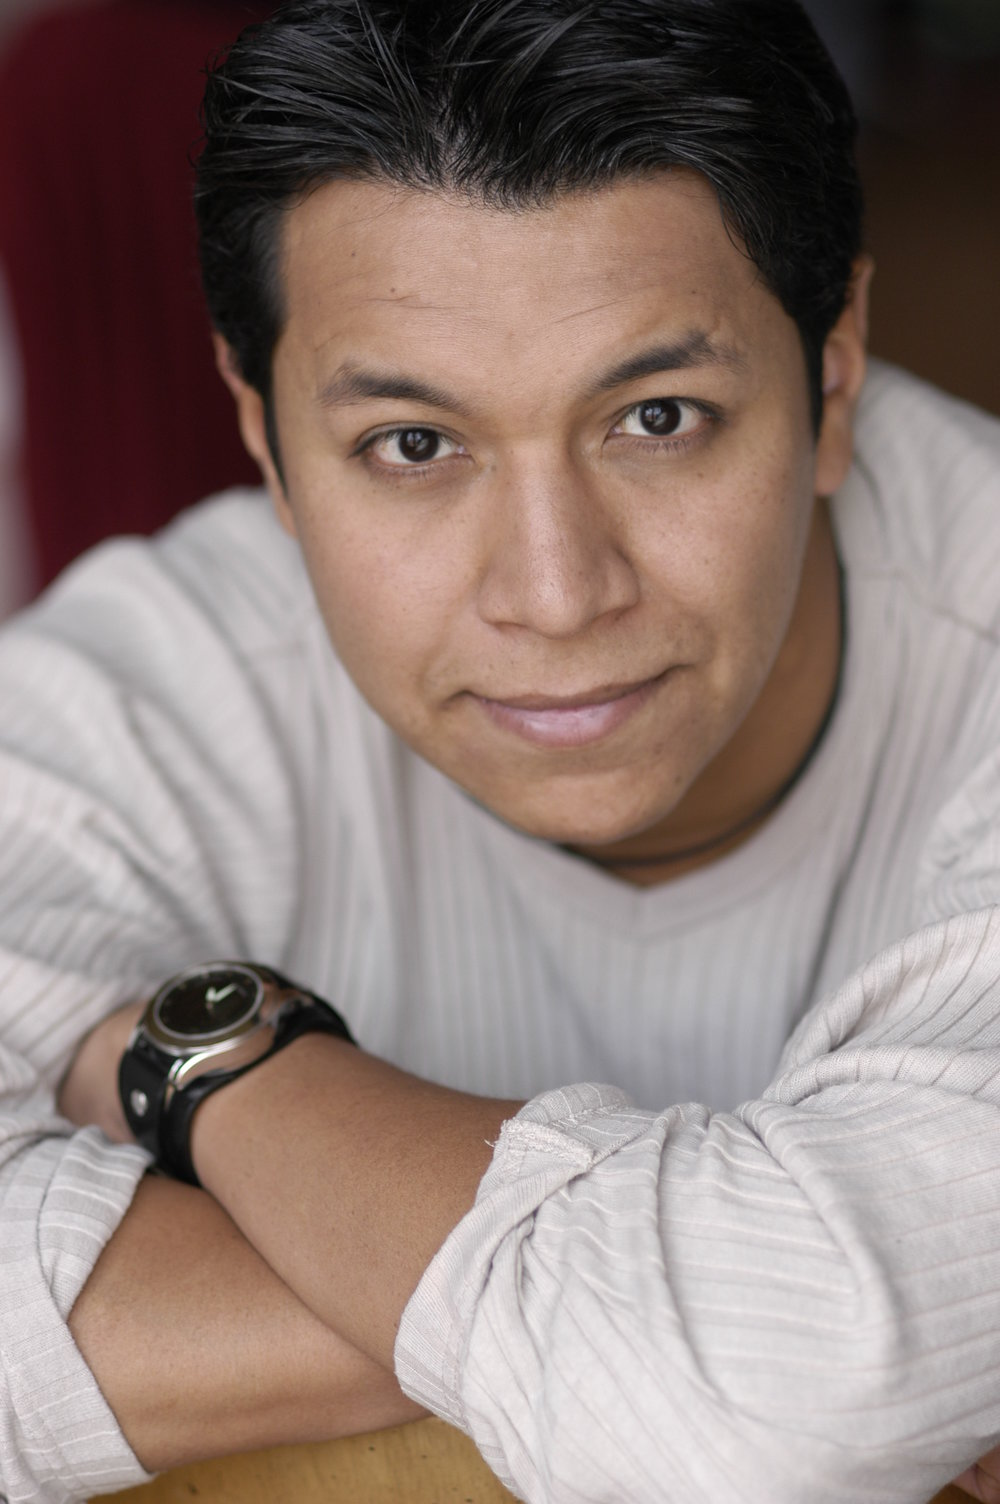 Cesar Jaime